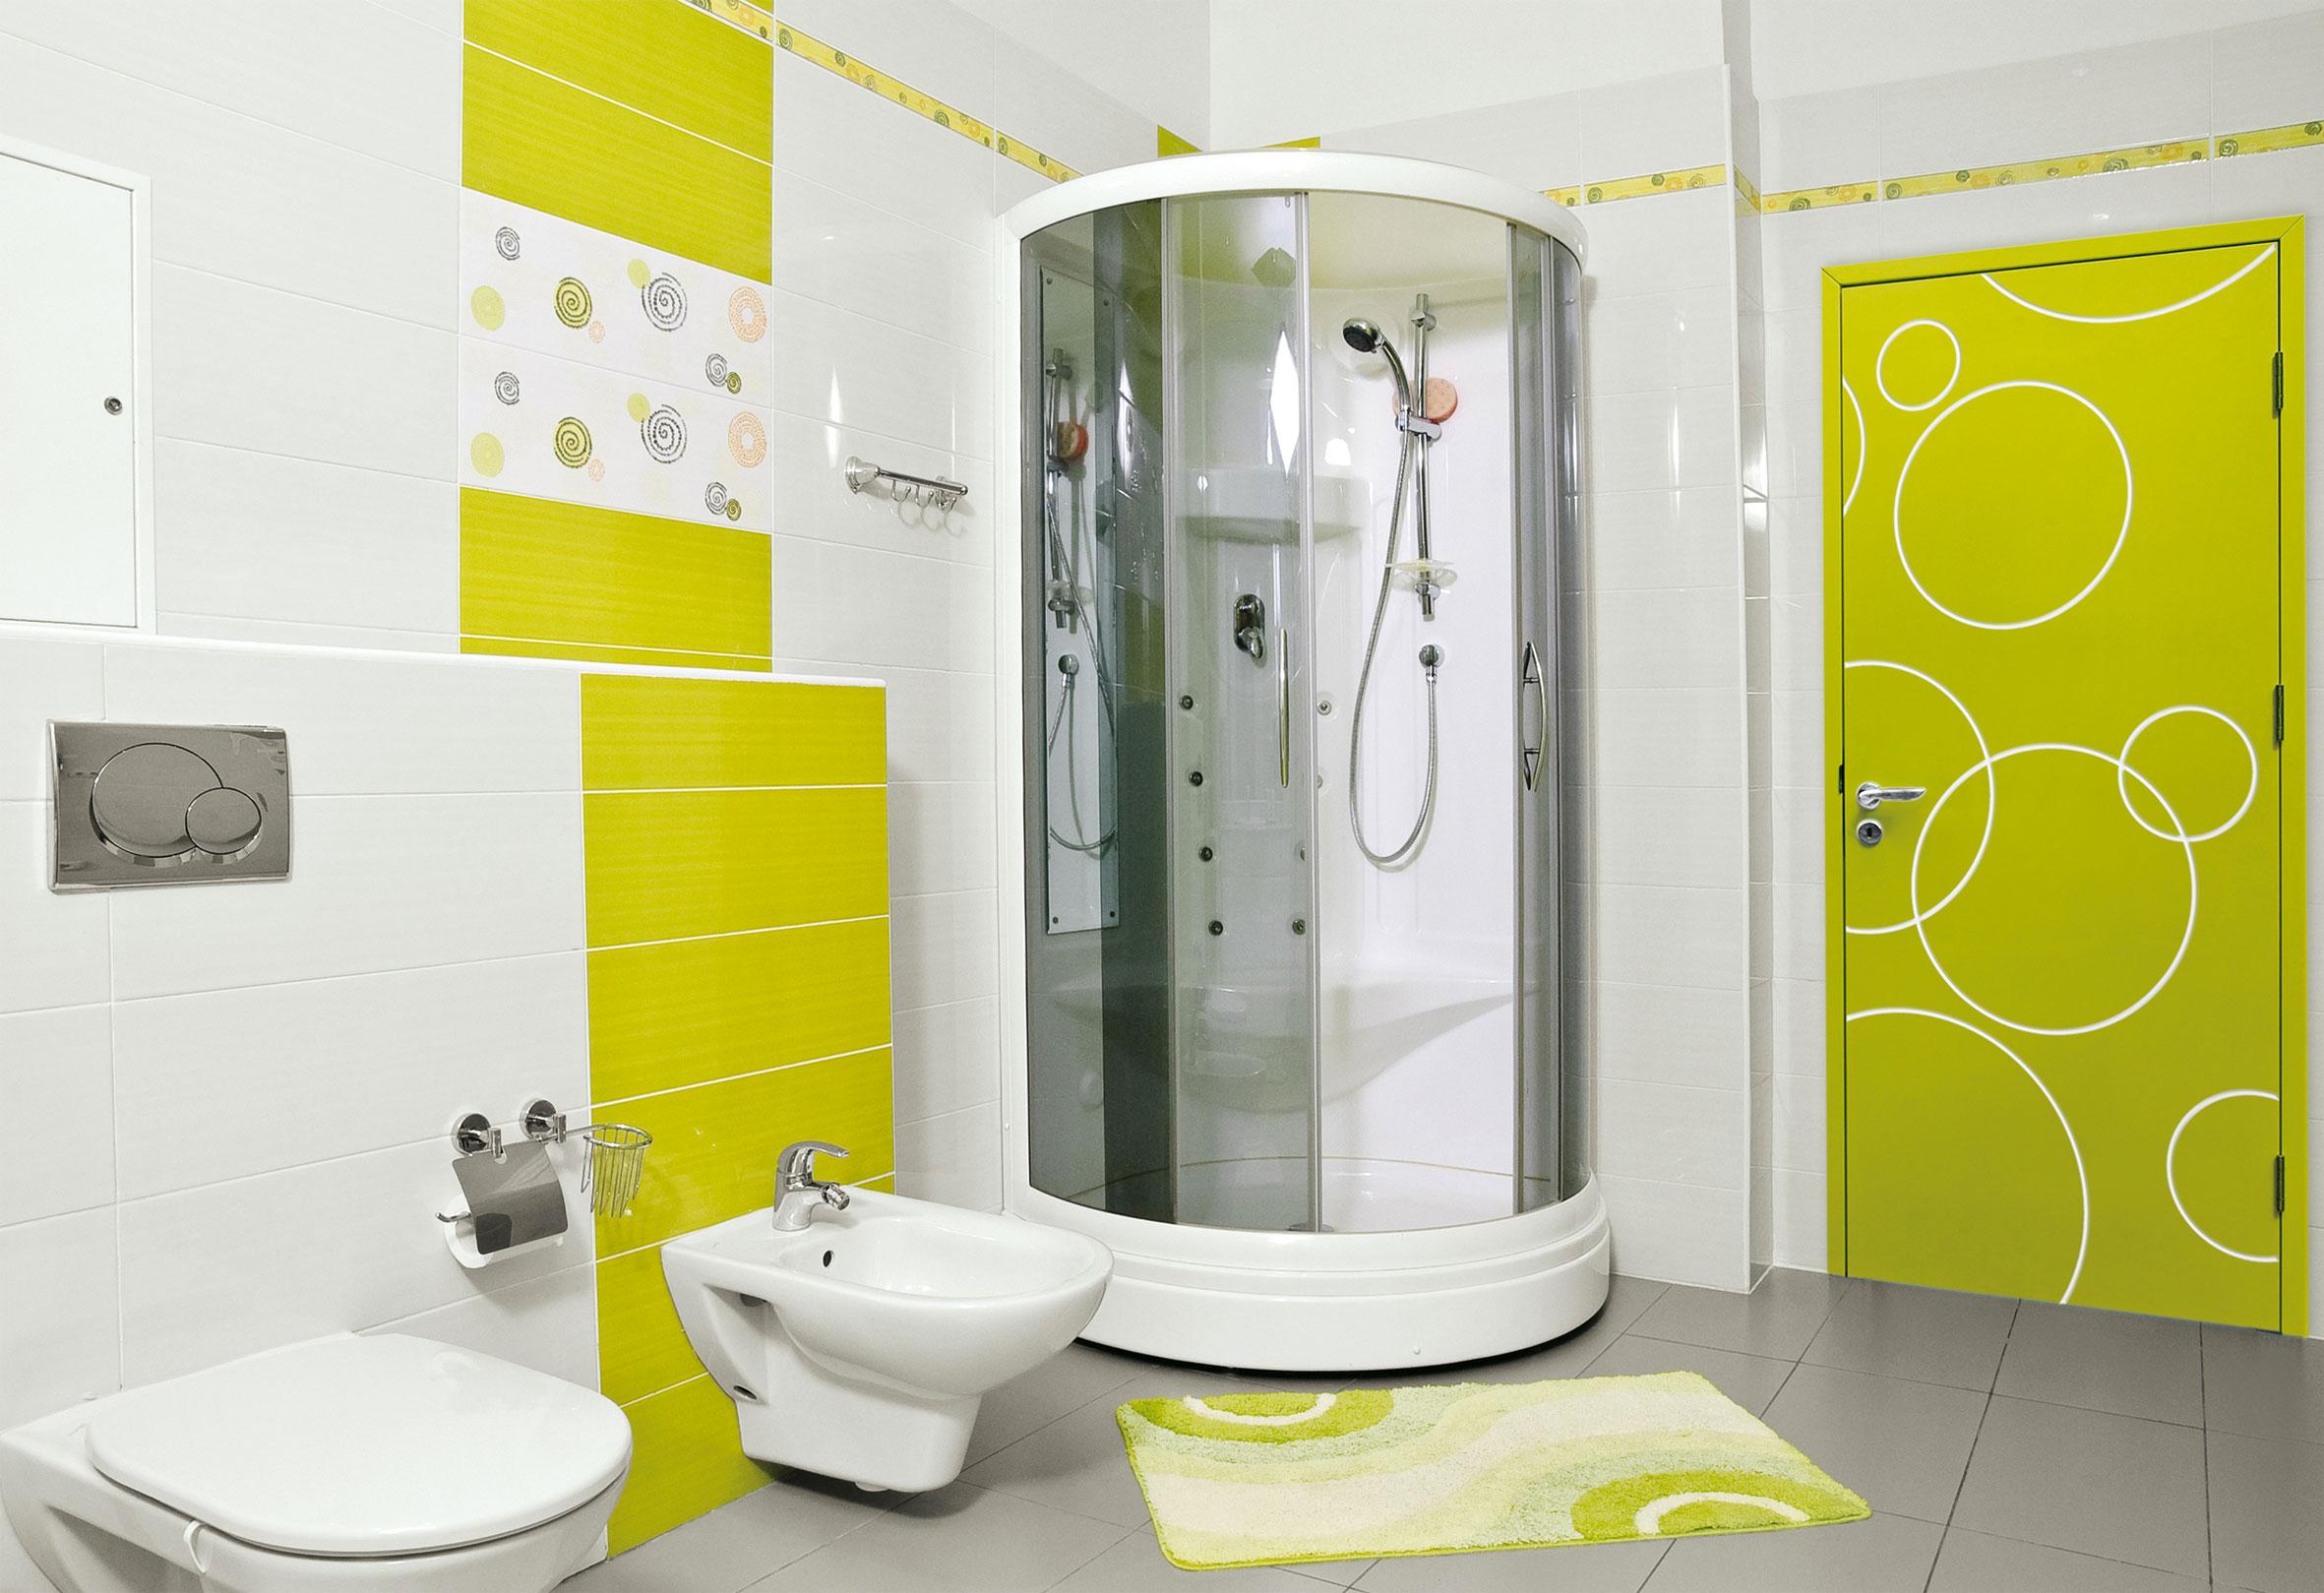 porte beaux arts isolante grav e finition pr peinte mod le bubble hue socoda n goces bois. Black Bedroom Furniture Sets. Home Design Ideas